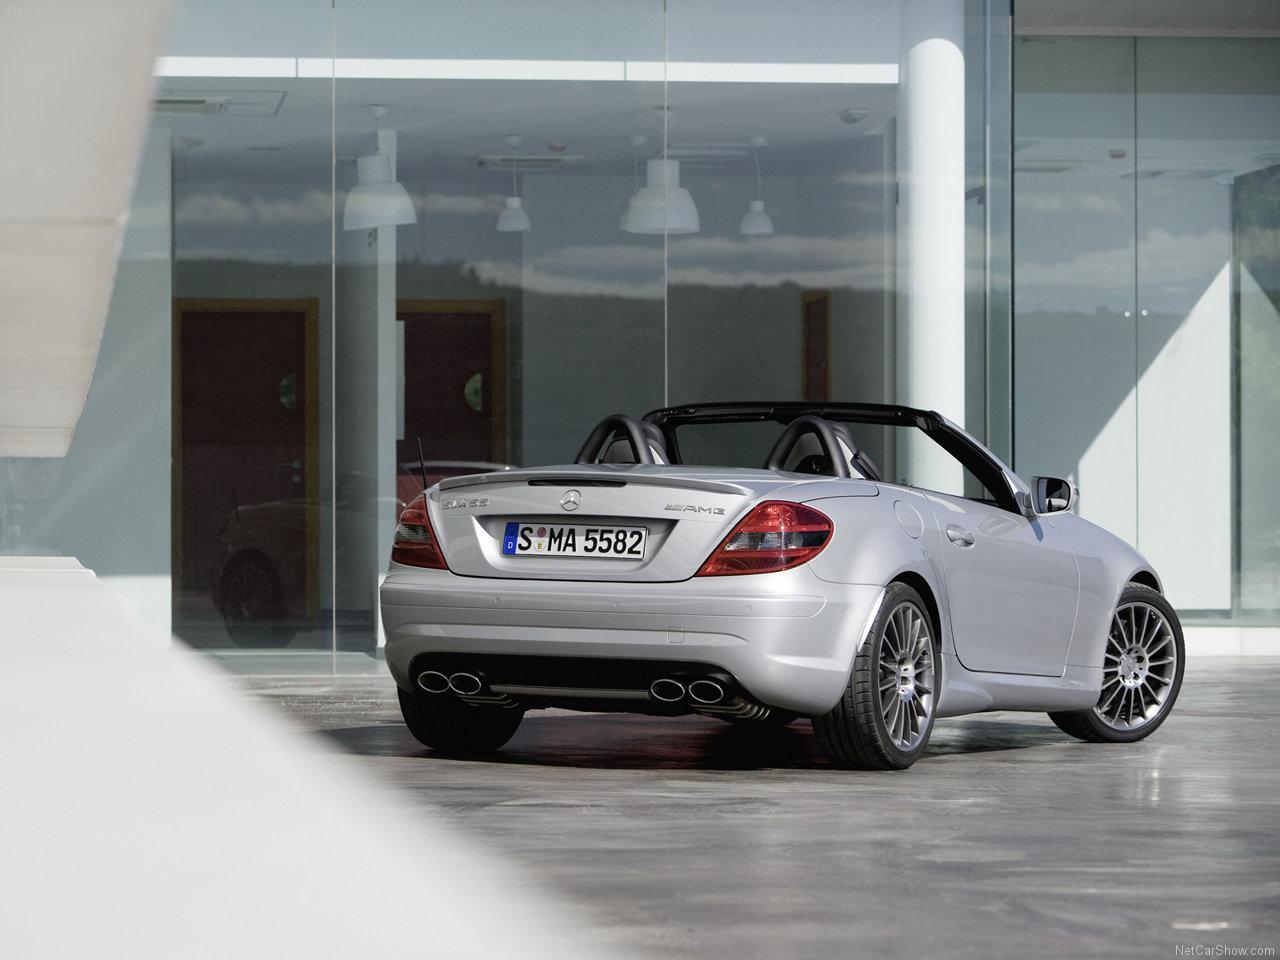 http://3.bp.blogspot.com/_3V1YR3u6VBg/S8Sjgpl23MI/AAAAAAAAB-E/--HPlVyBUco/s1600/Mercedes-Benz-SLK_55_AMG_2008_1280x960_wallpaper_05.jpg